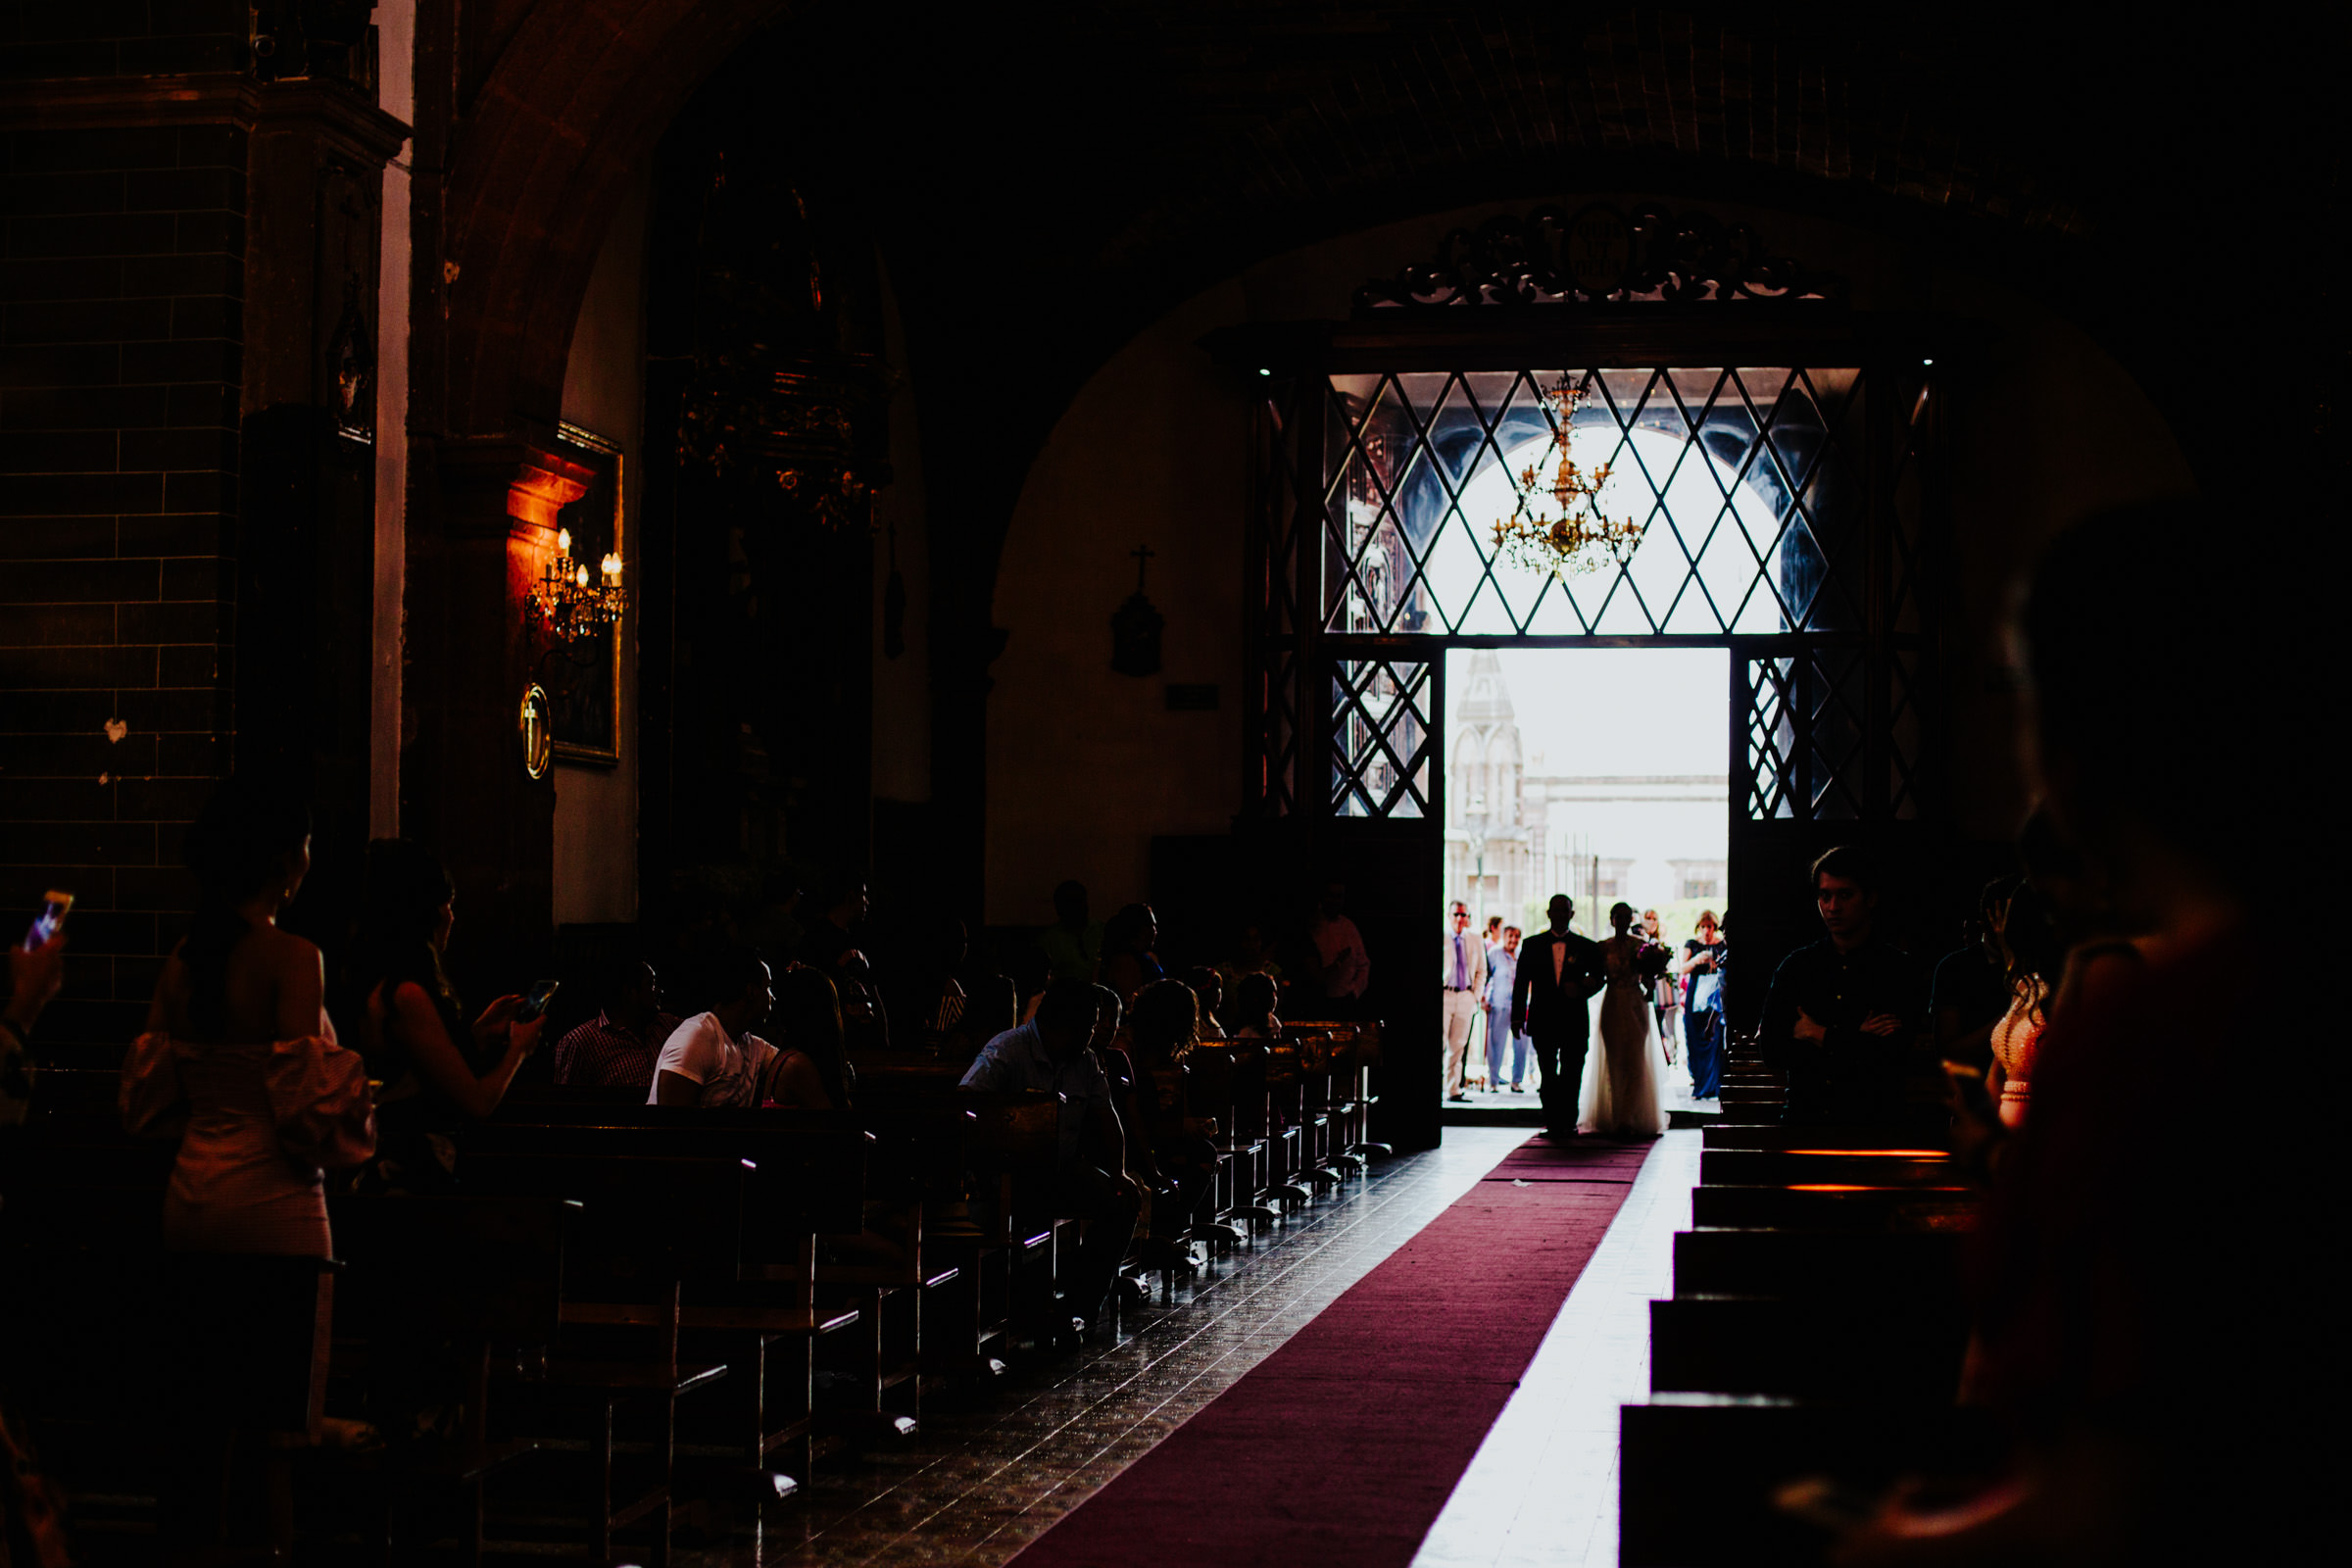 San-Miguel-de-Allende-Wedding-Photography-Parroquia-Instituto-Boda-Fotografia-Fer-Sergio-Pierce-Lifestyle-Photography0264.JPG